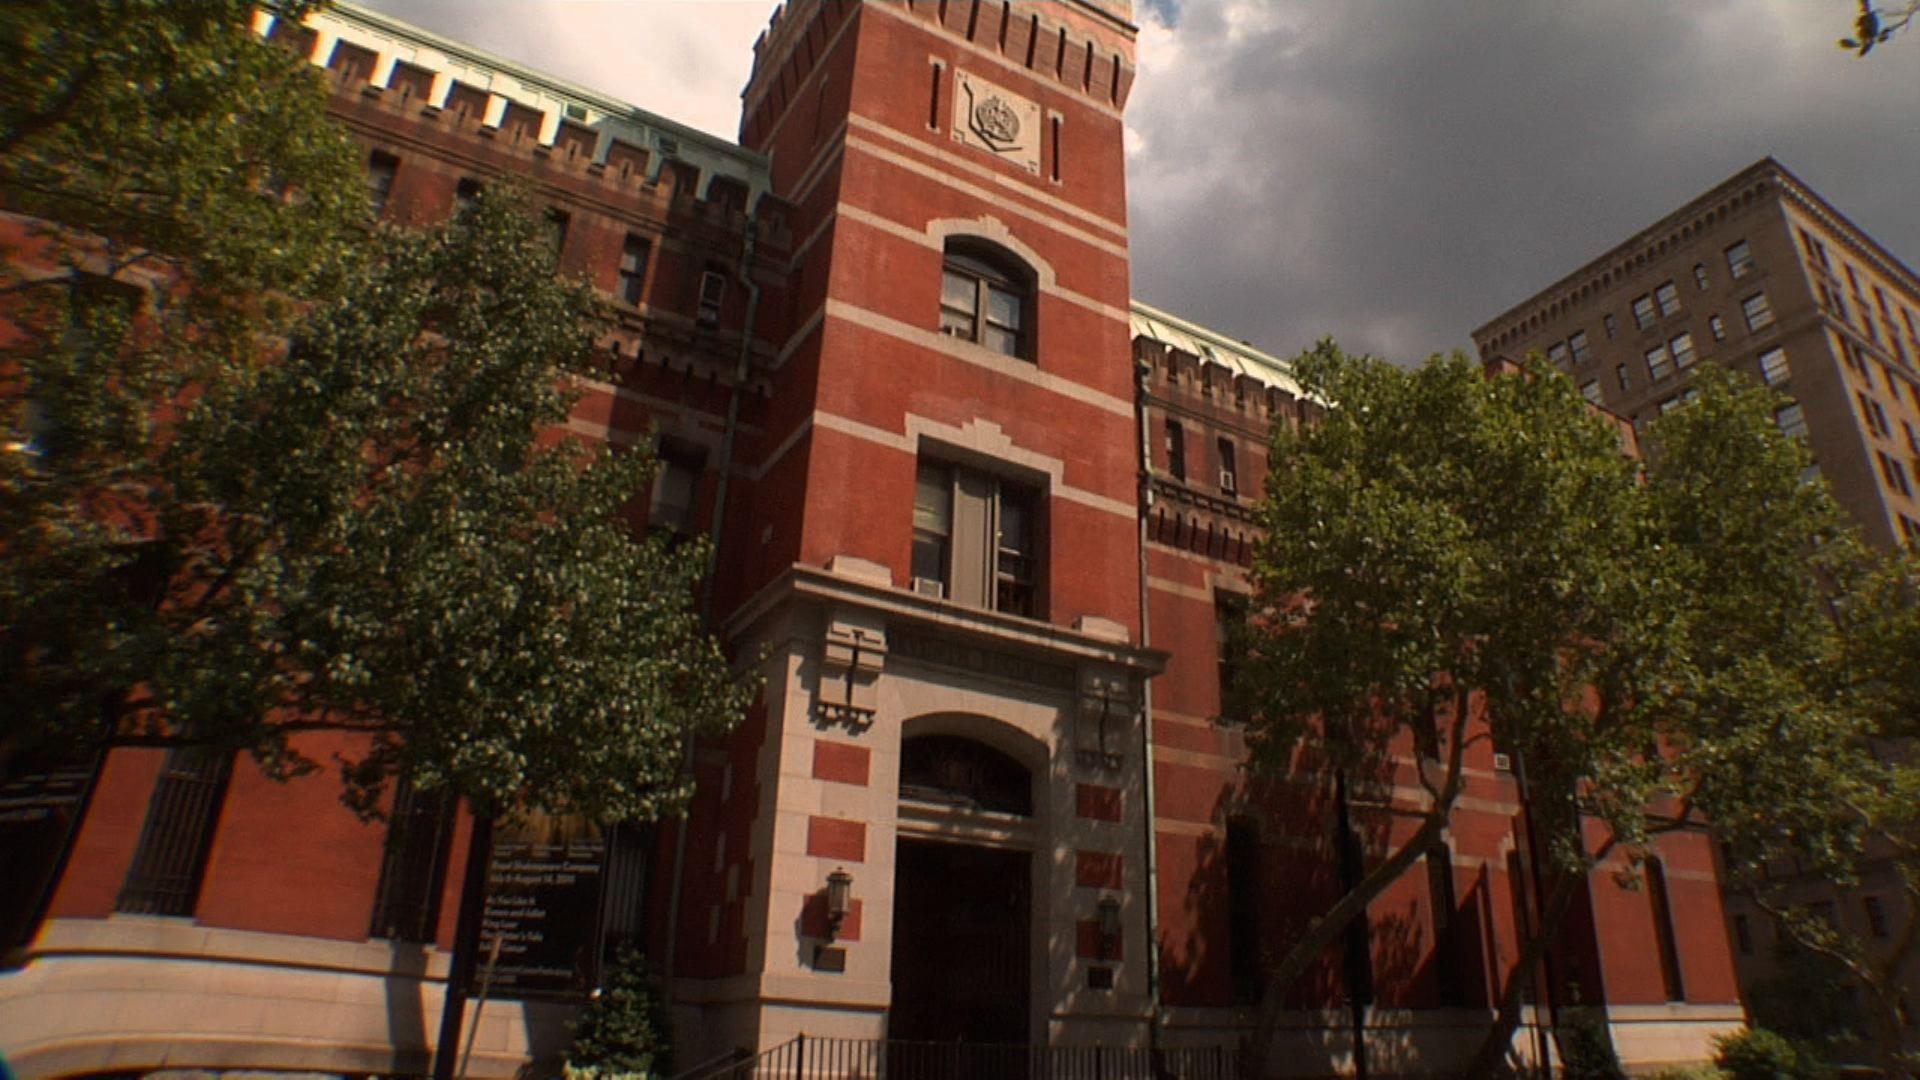 Video Park Avenue Armory